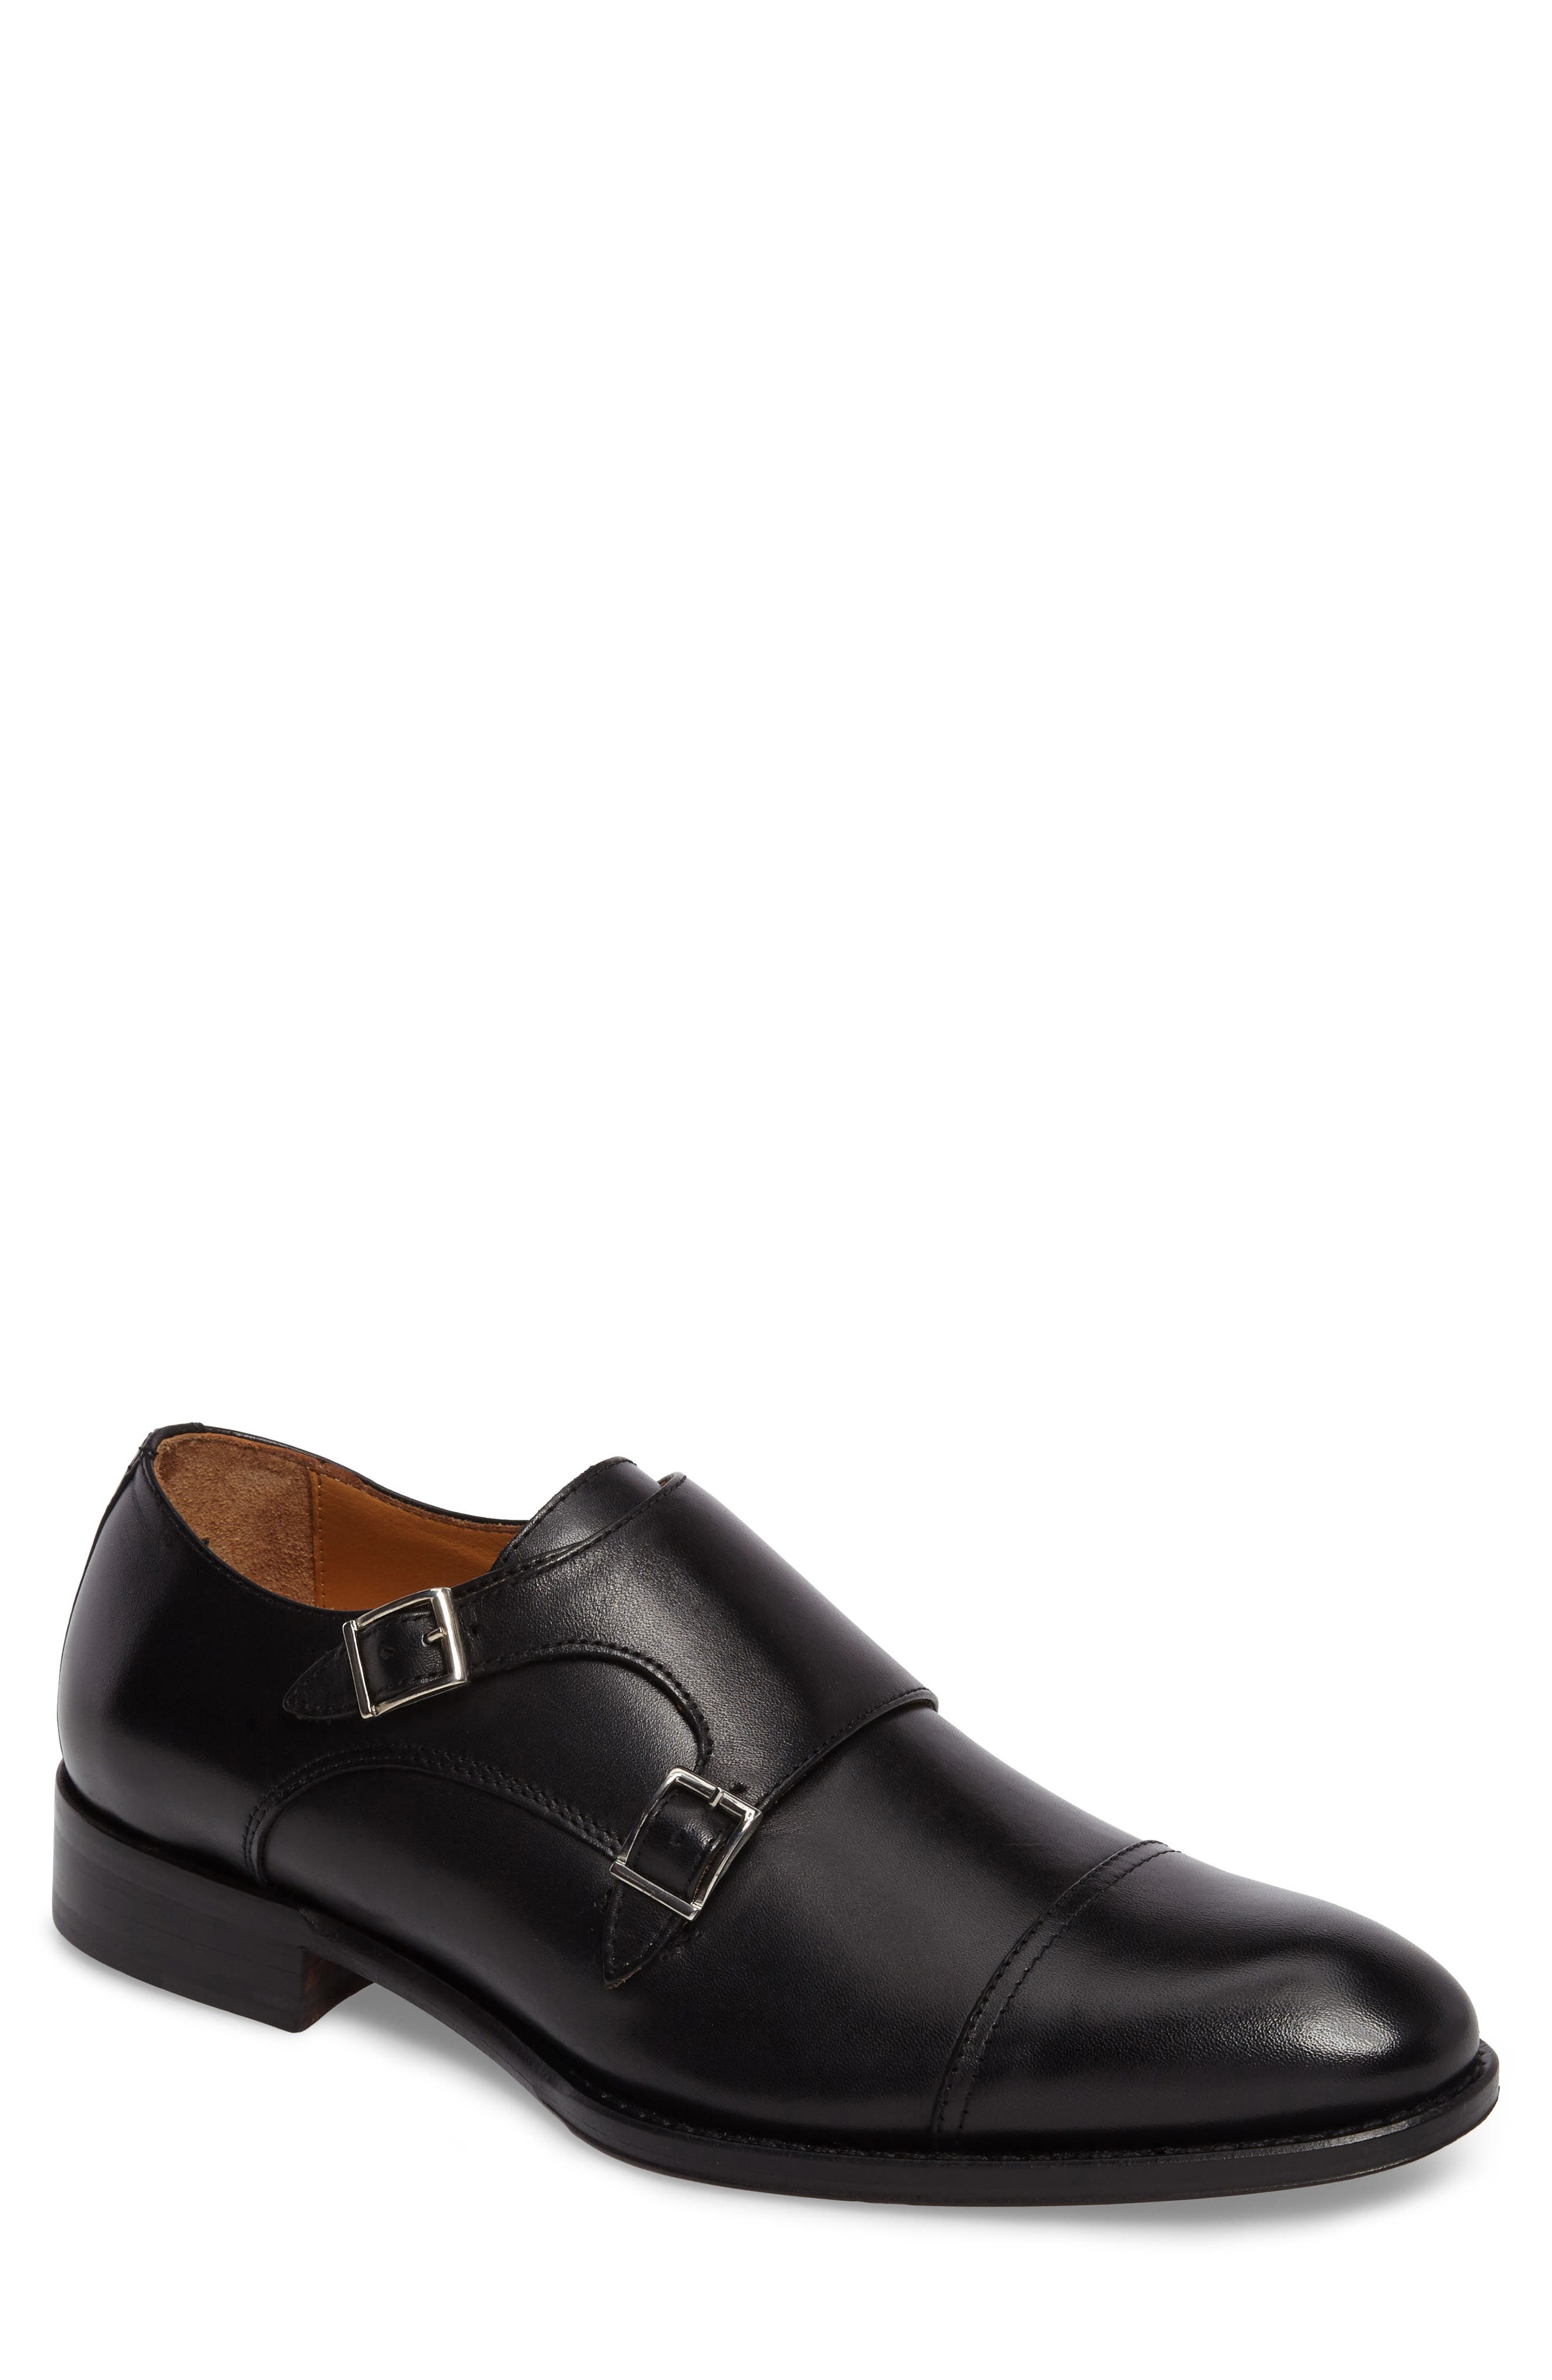 Stratton Double Monk Strap Shoe,                         Main,                         color, 001